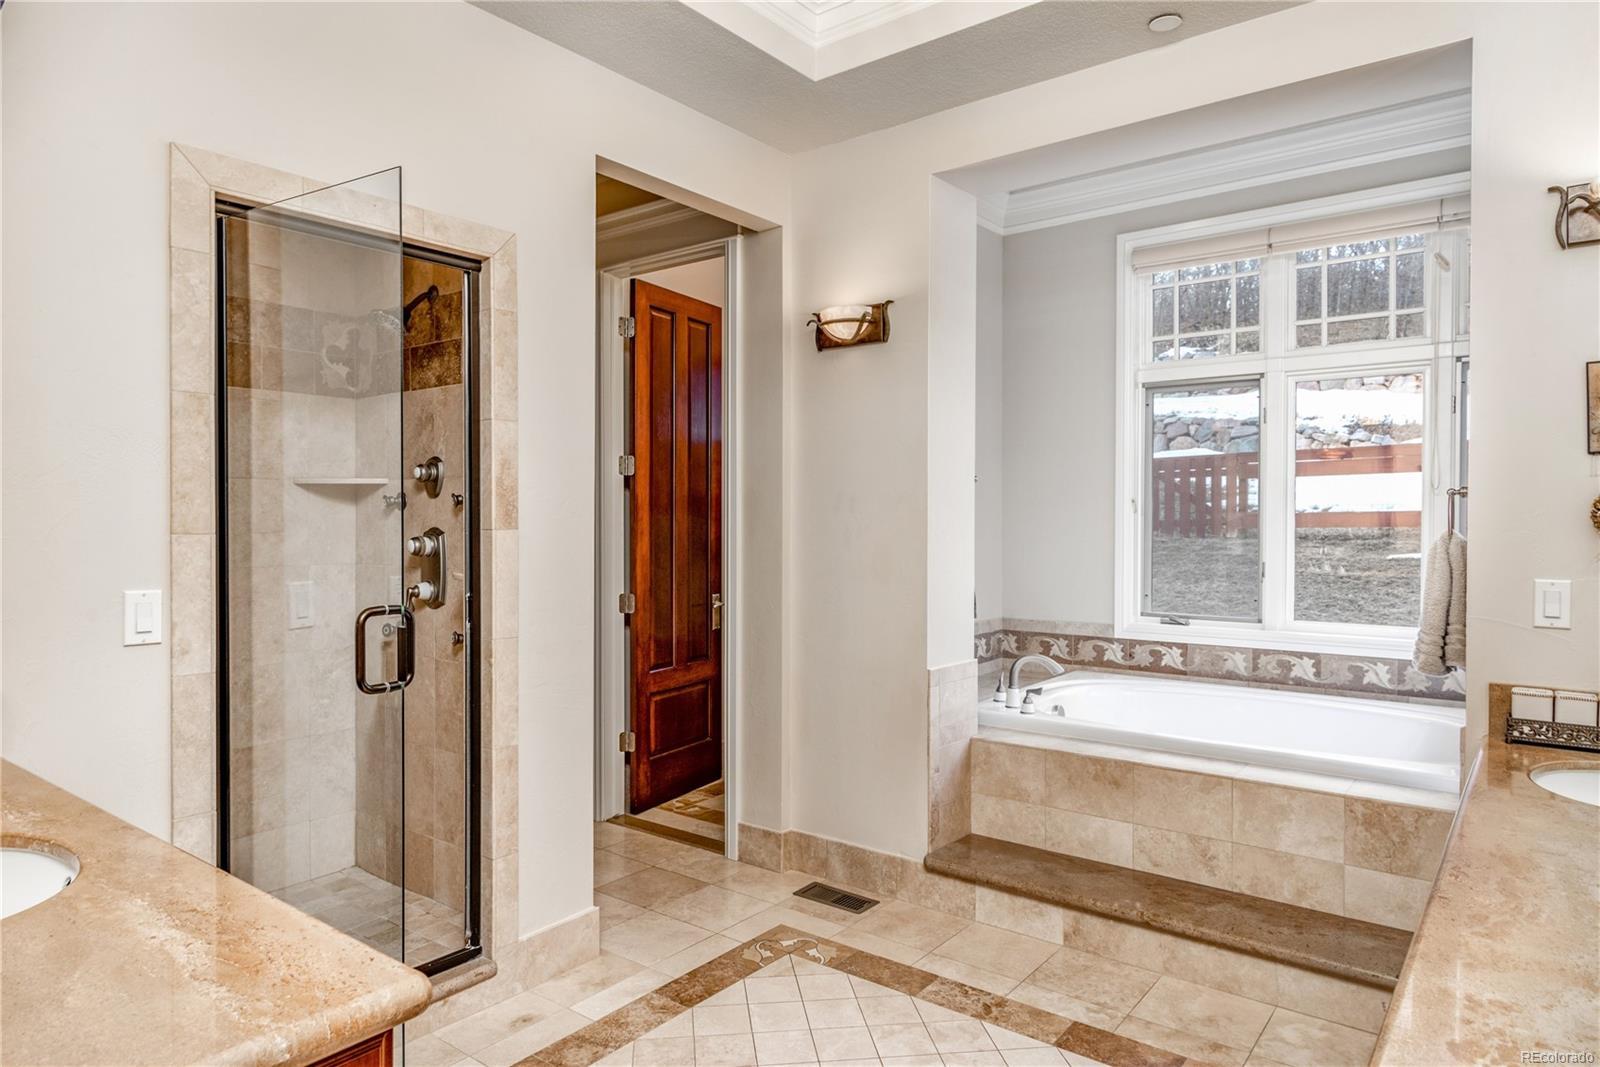 master bath boasts heated floors and European tile accents.